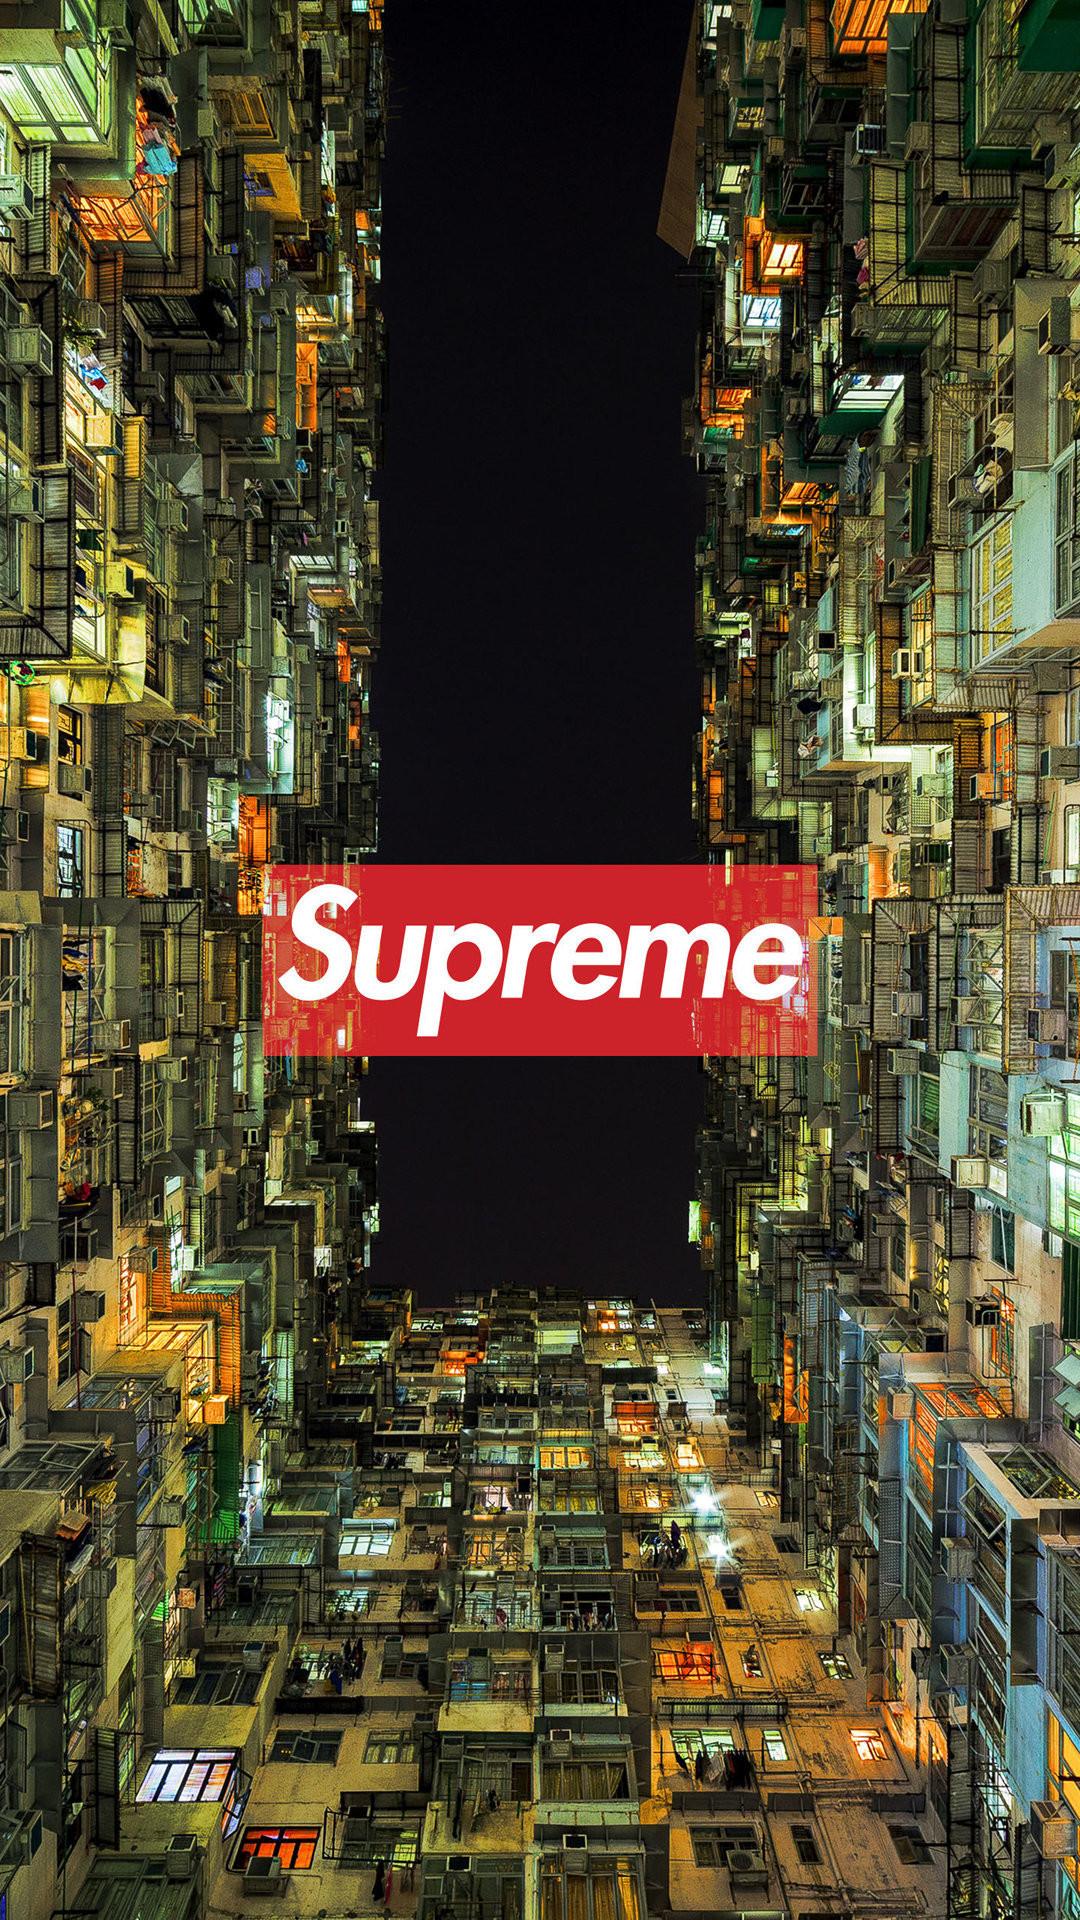 Bape Iphone 7 Wallpaper Supreme Wallpaper 87 Immagini